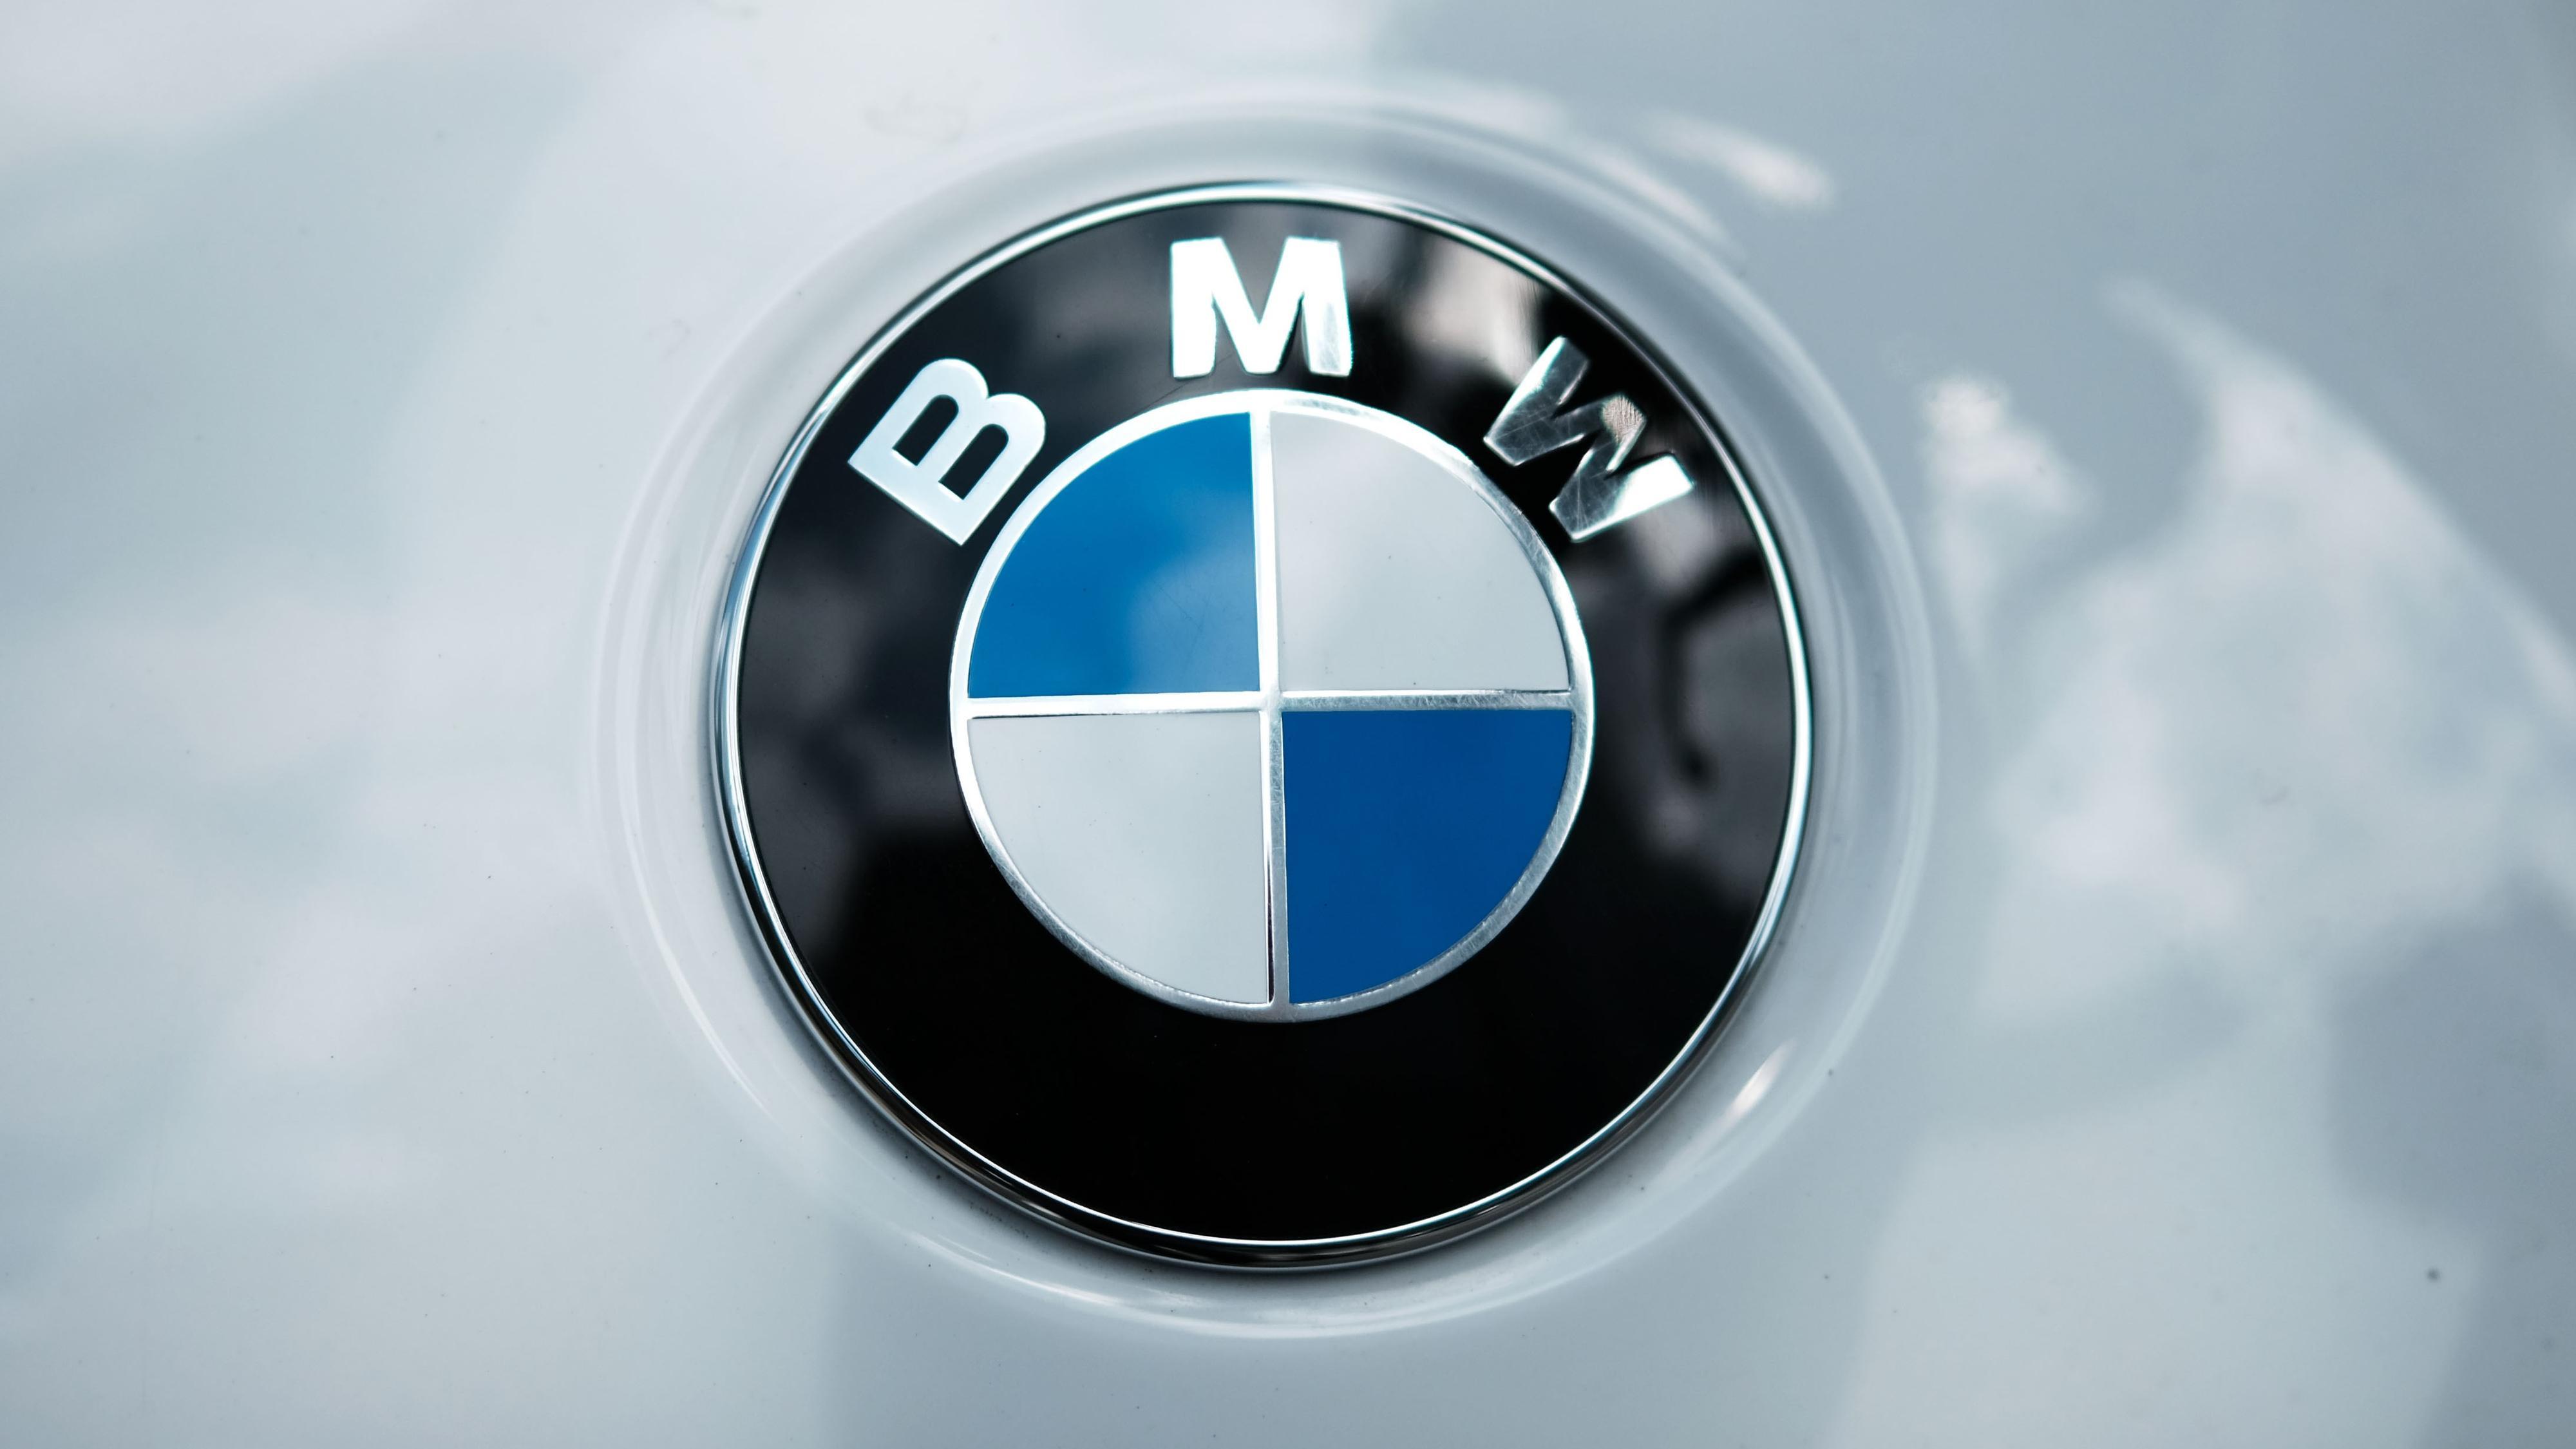 BMW ville ta betalt for CarPlay – nå snur de